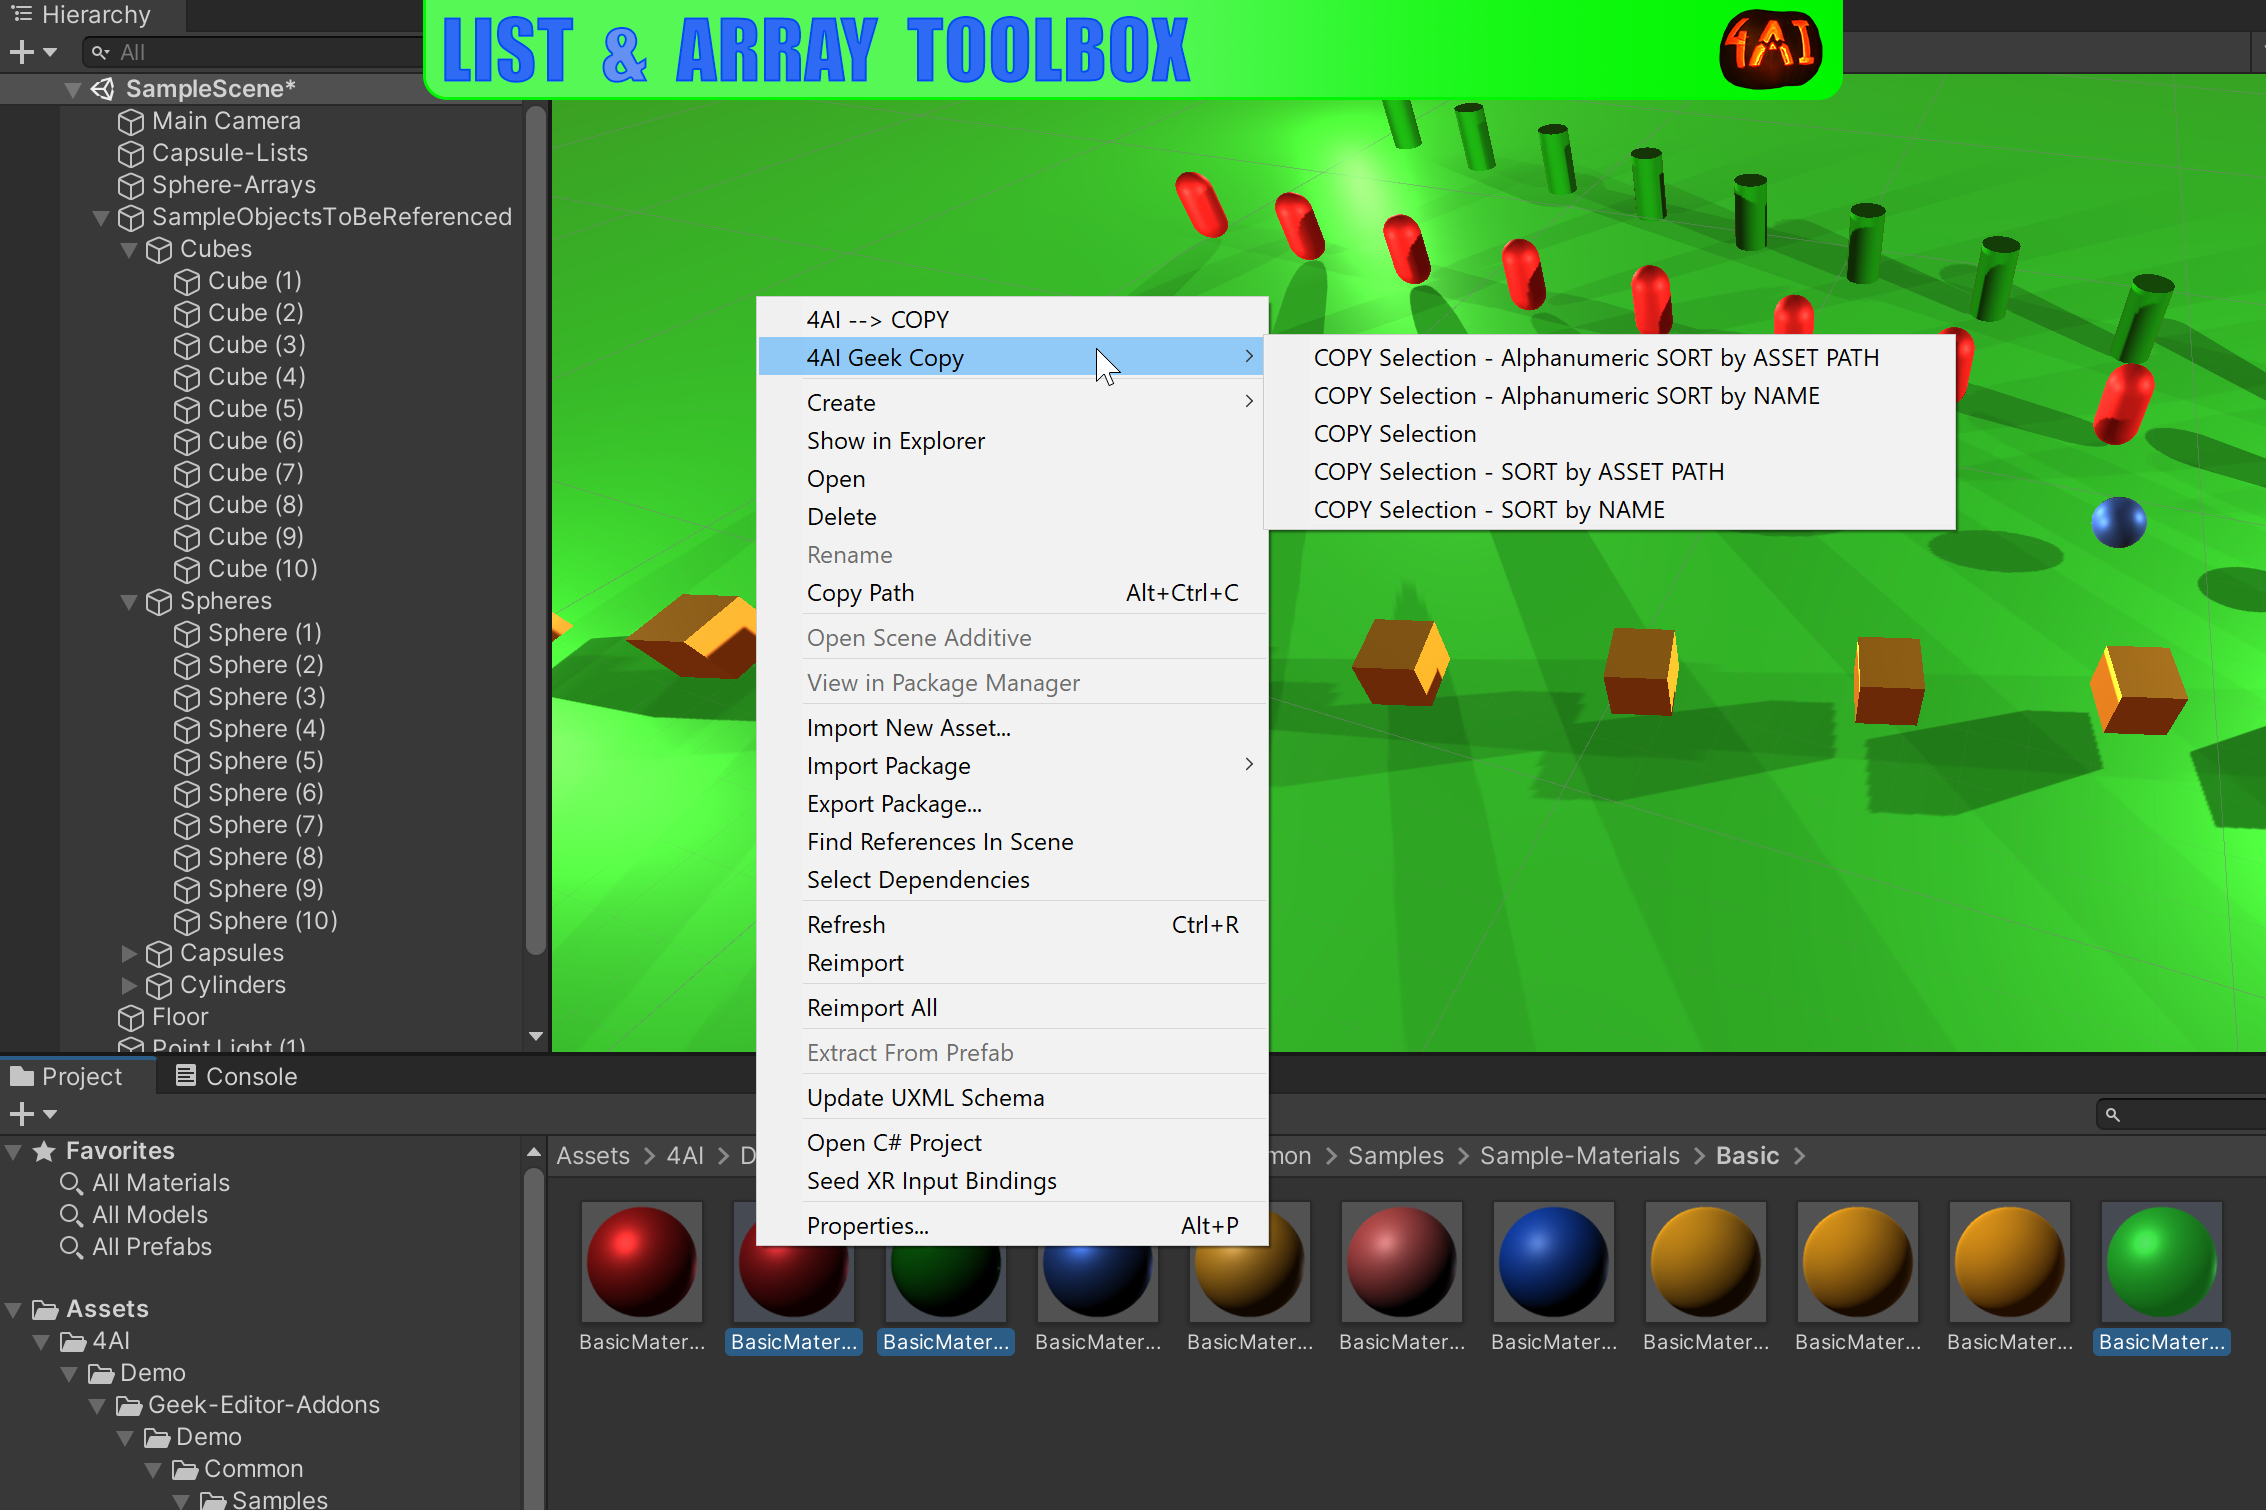 list-array-toolbox-2.png